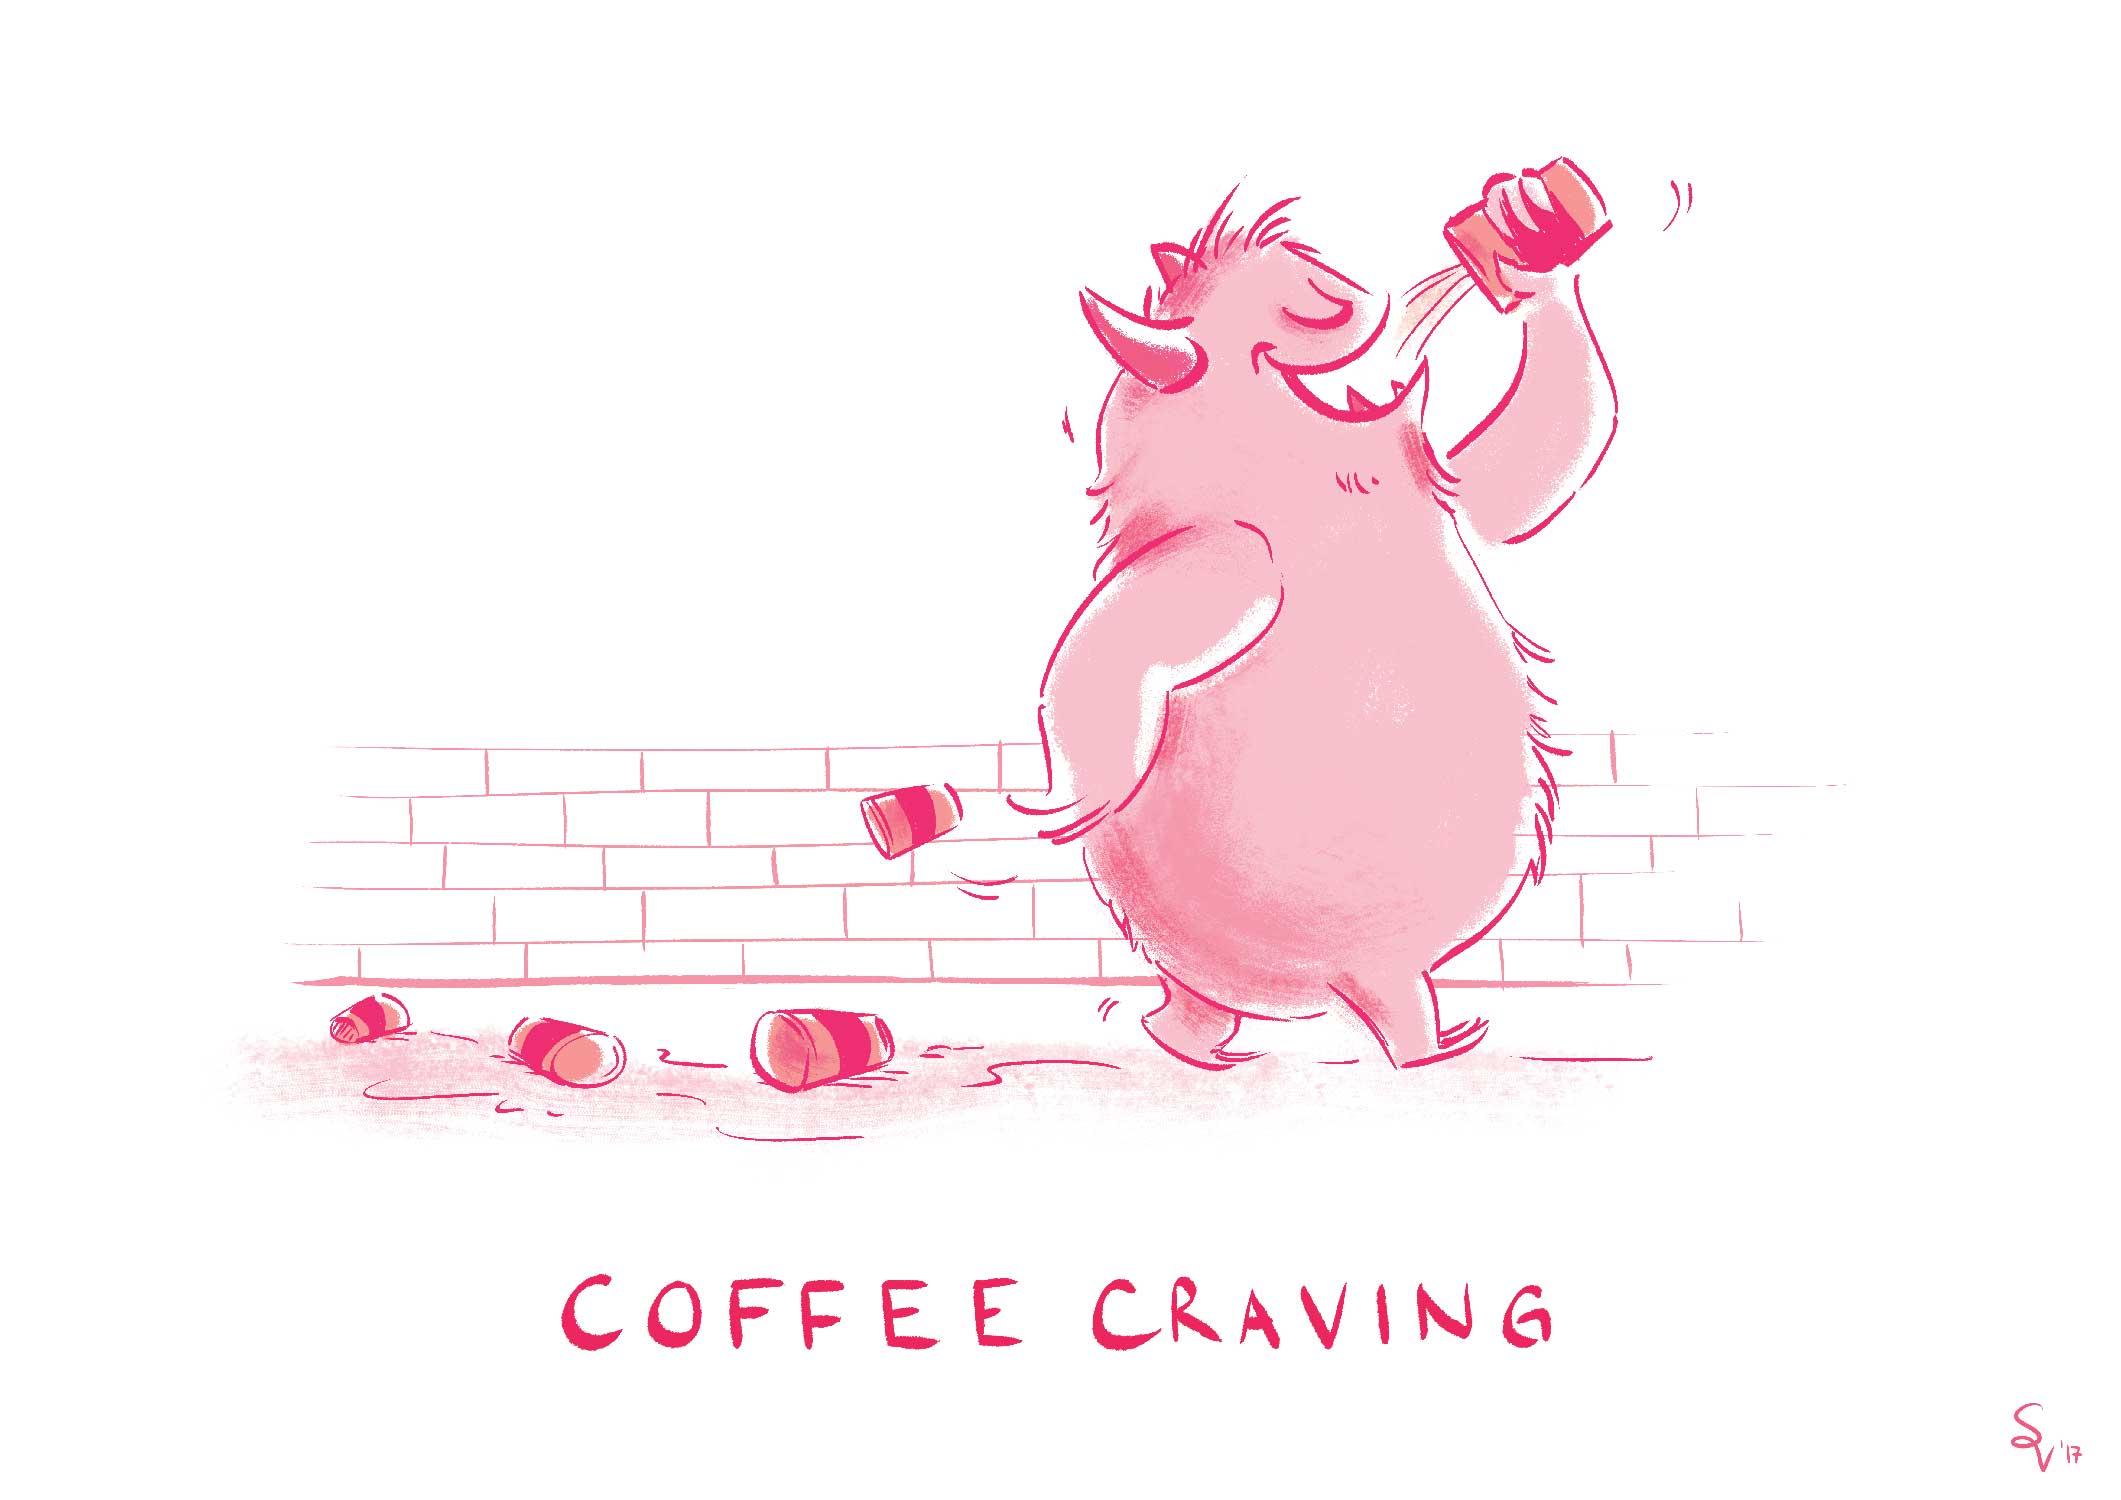 13_CoffeeCraving.jpg